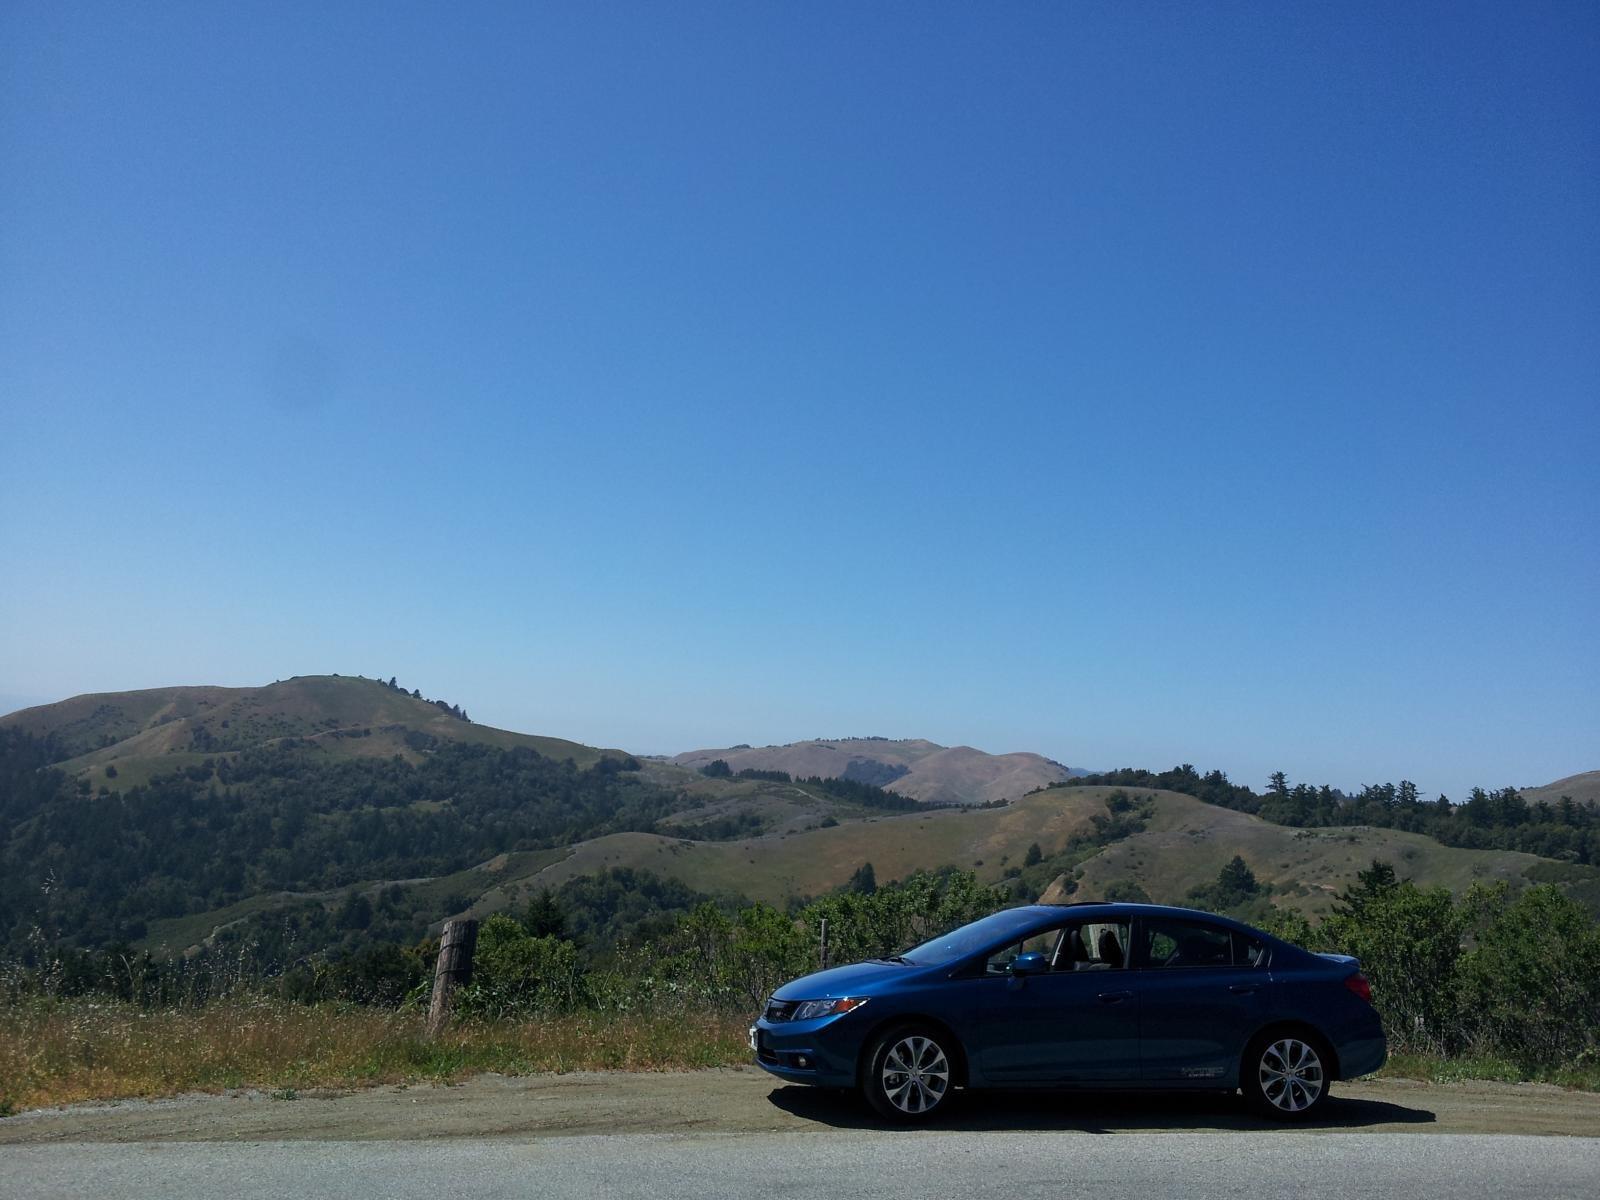 2012 Civic Si Sedan. Dyno Blue Pearl-side1.jpg